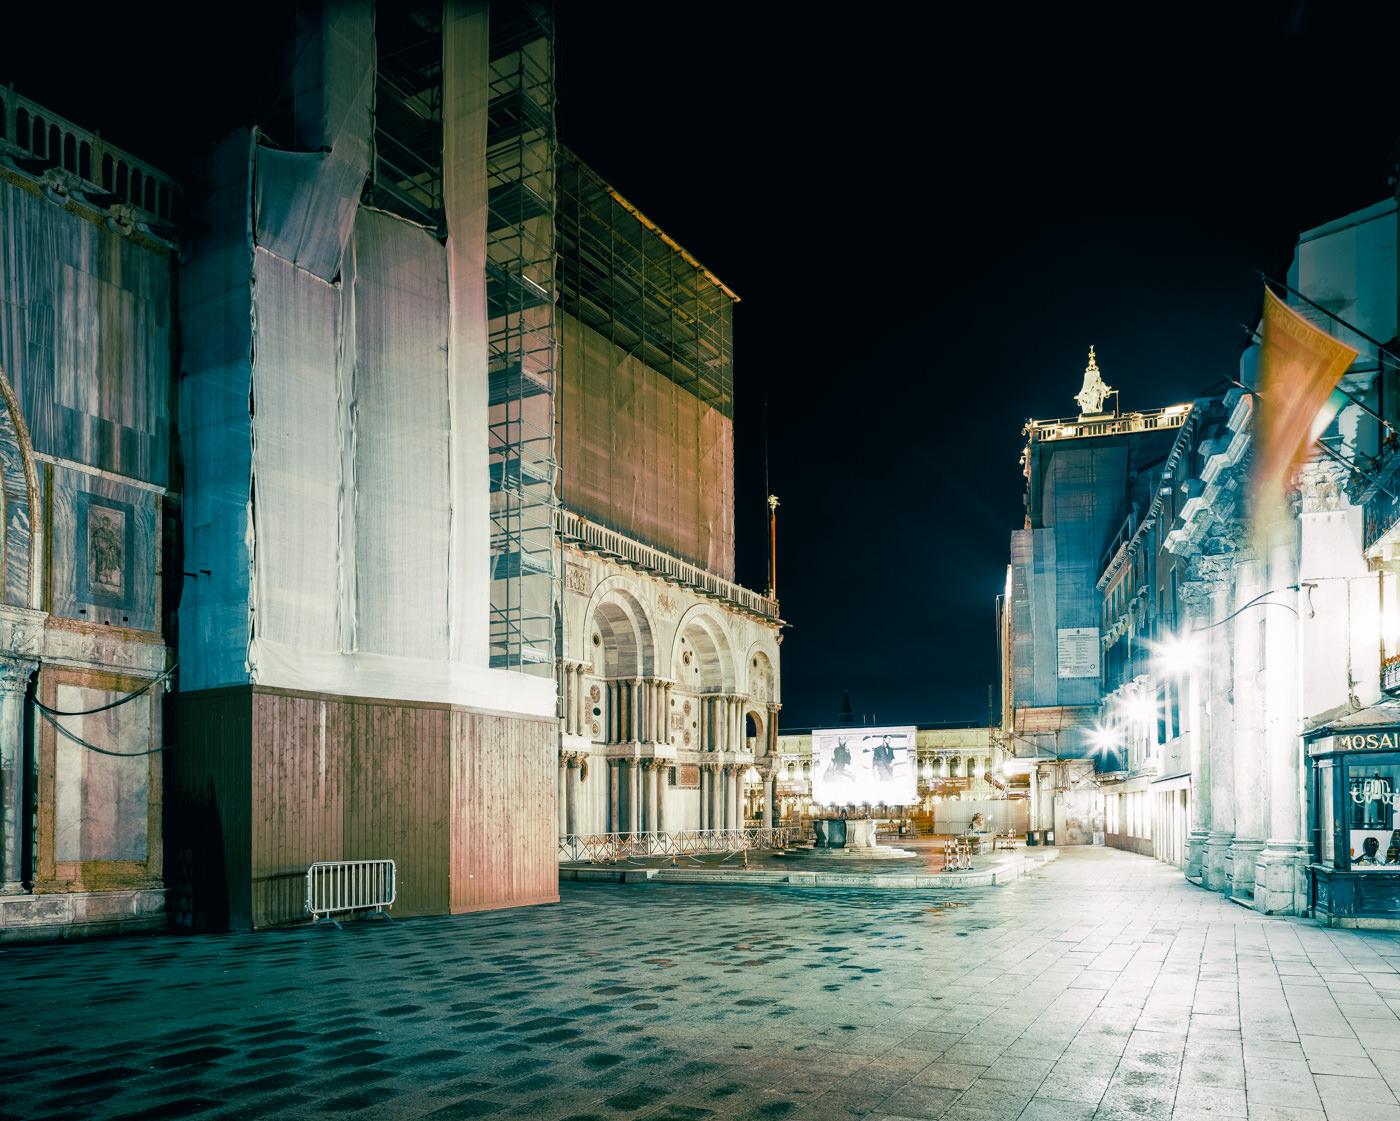 """Basilica di San Marco, Venice"" from the series Nylon Chrysalis, by William Mokrynski"